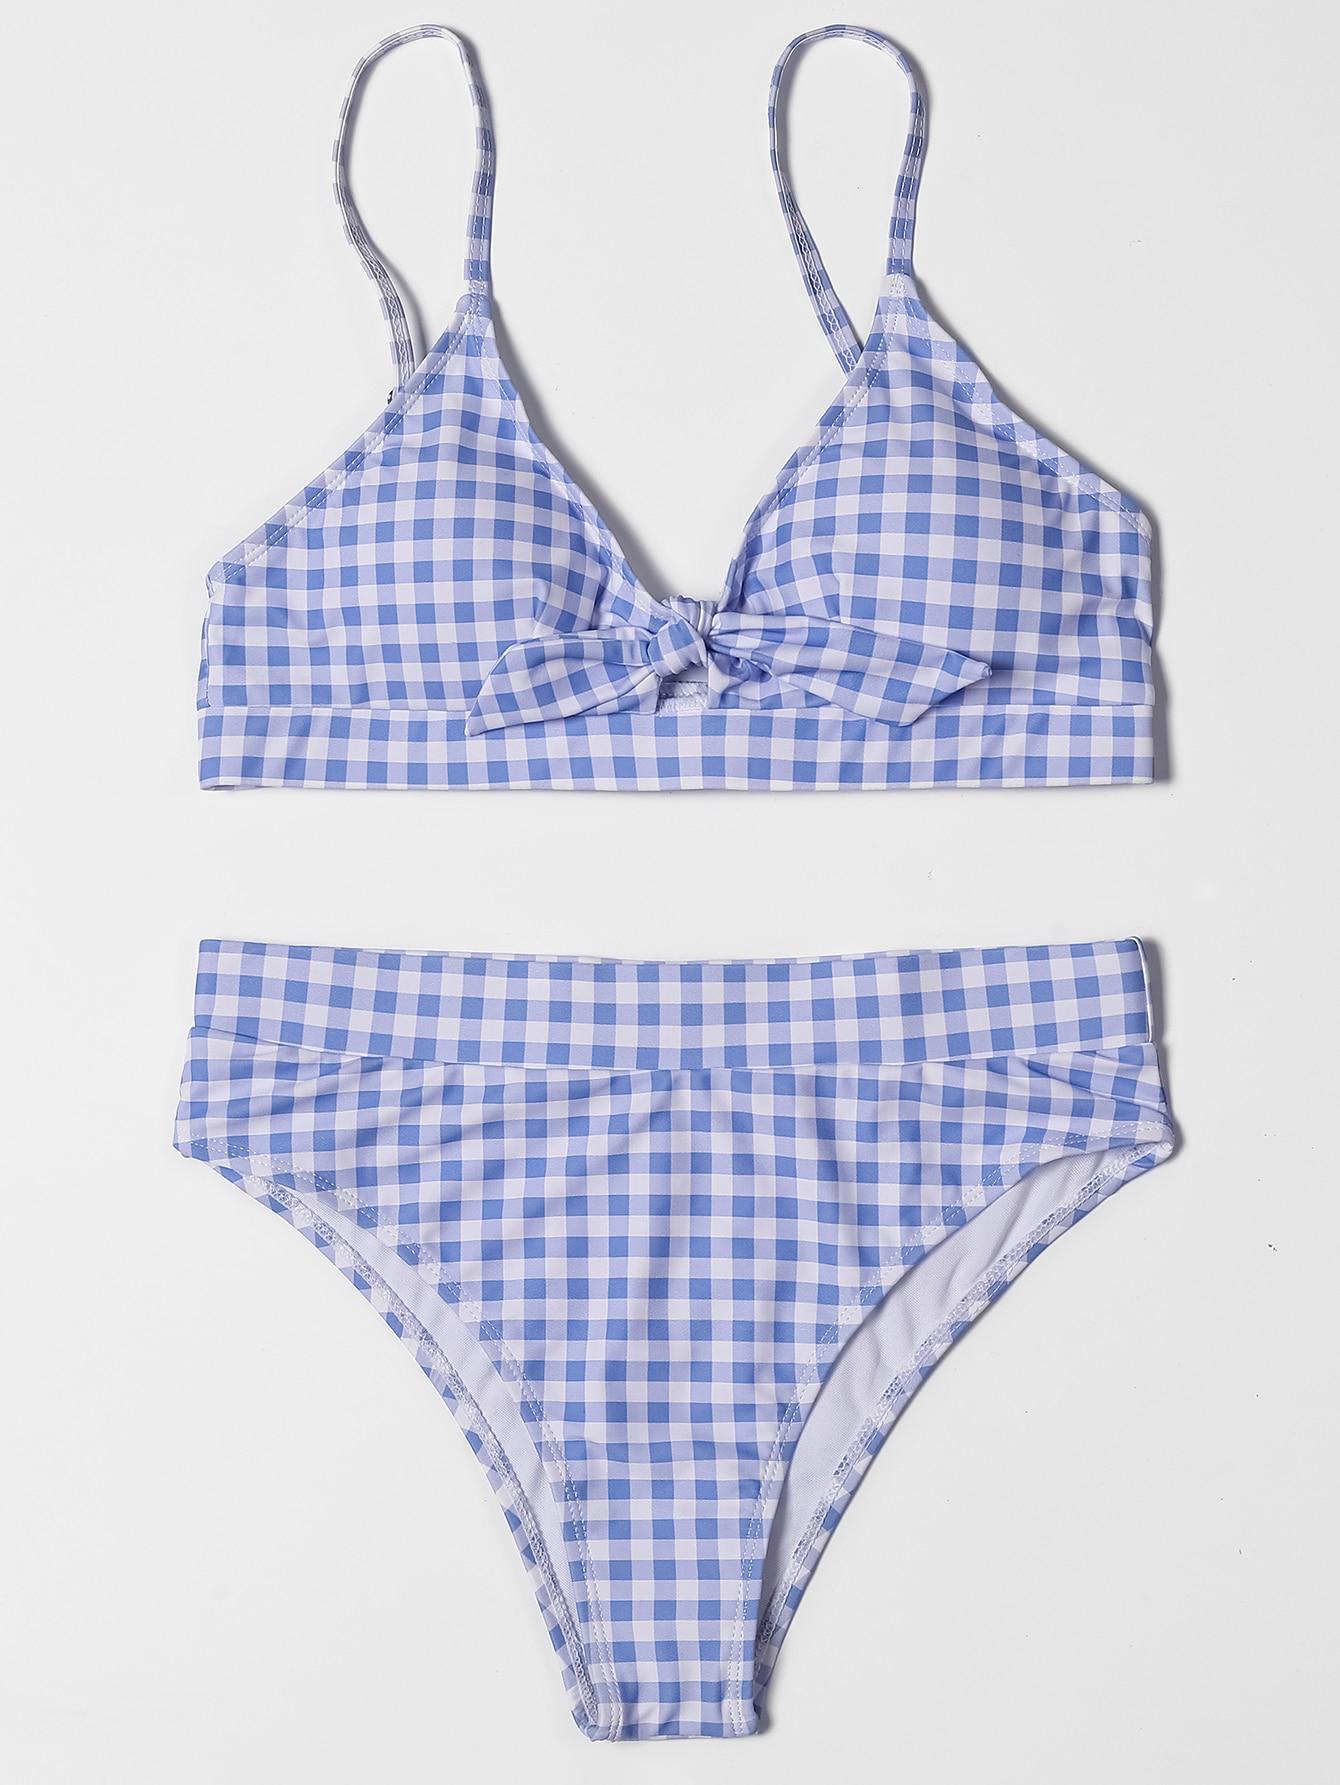 ZTVitality Bow Plaid Bikinis Push Up Sexy Bikini 2021 Hot Sale Straps Padded High Waist Swimsuit Retro Swimwear Women Biquini